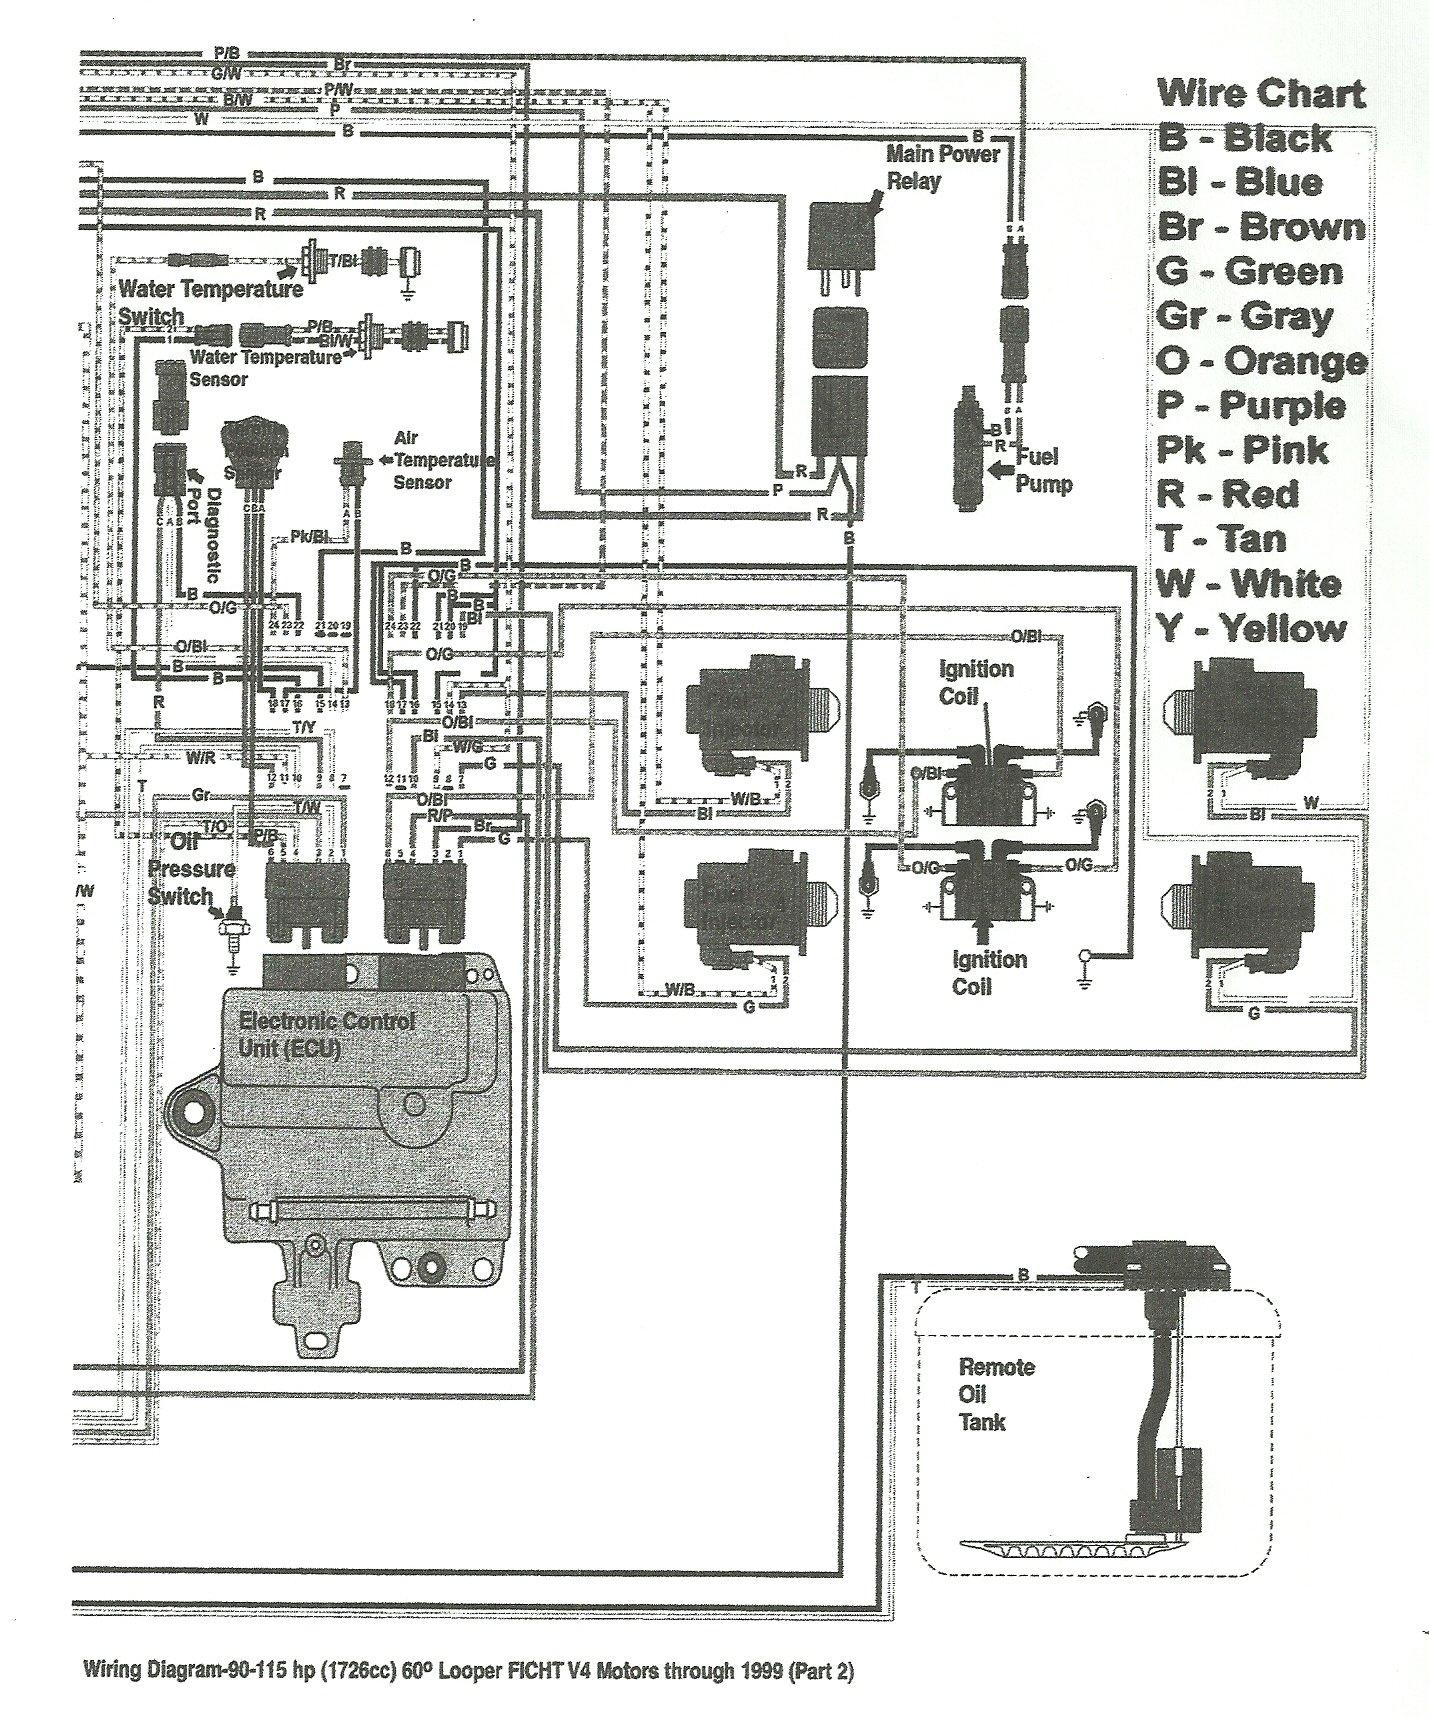 1971 Starcraft Boat Wiring Diagram